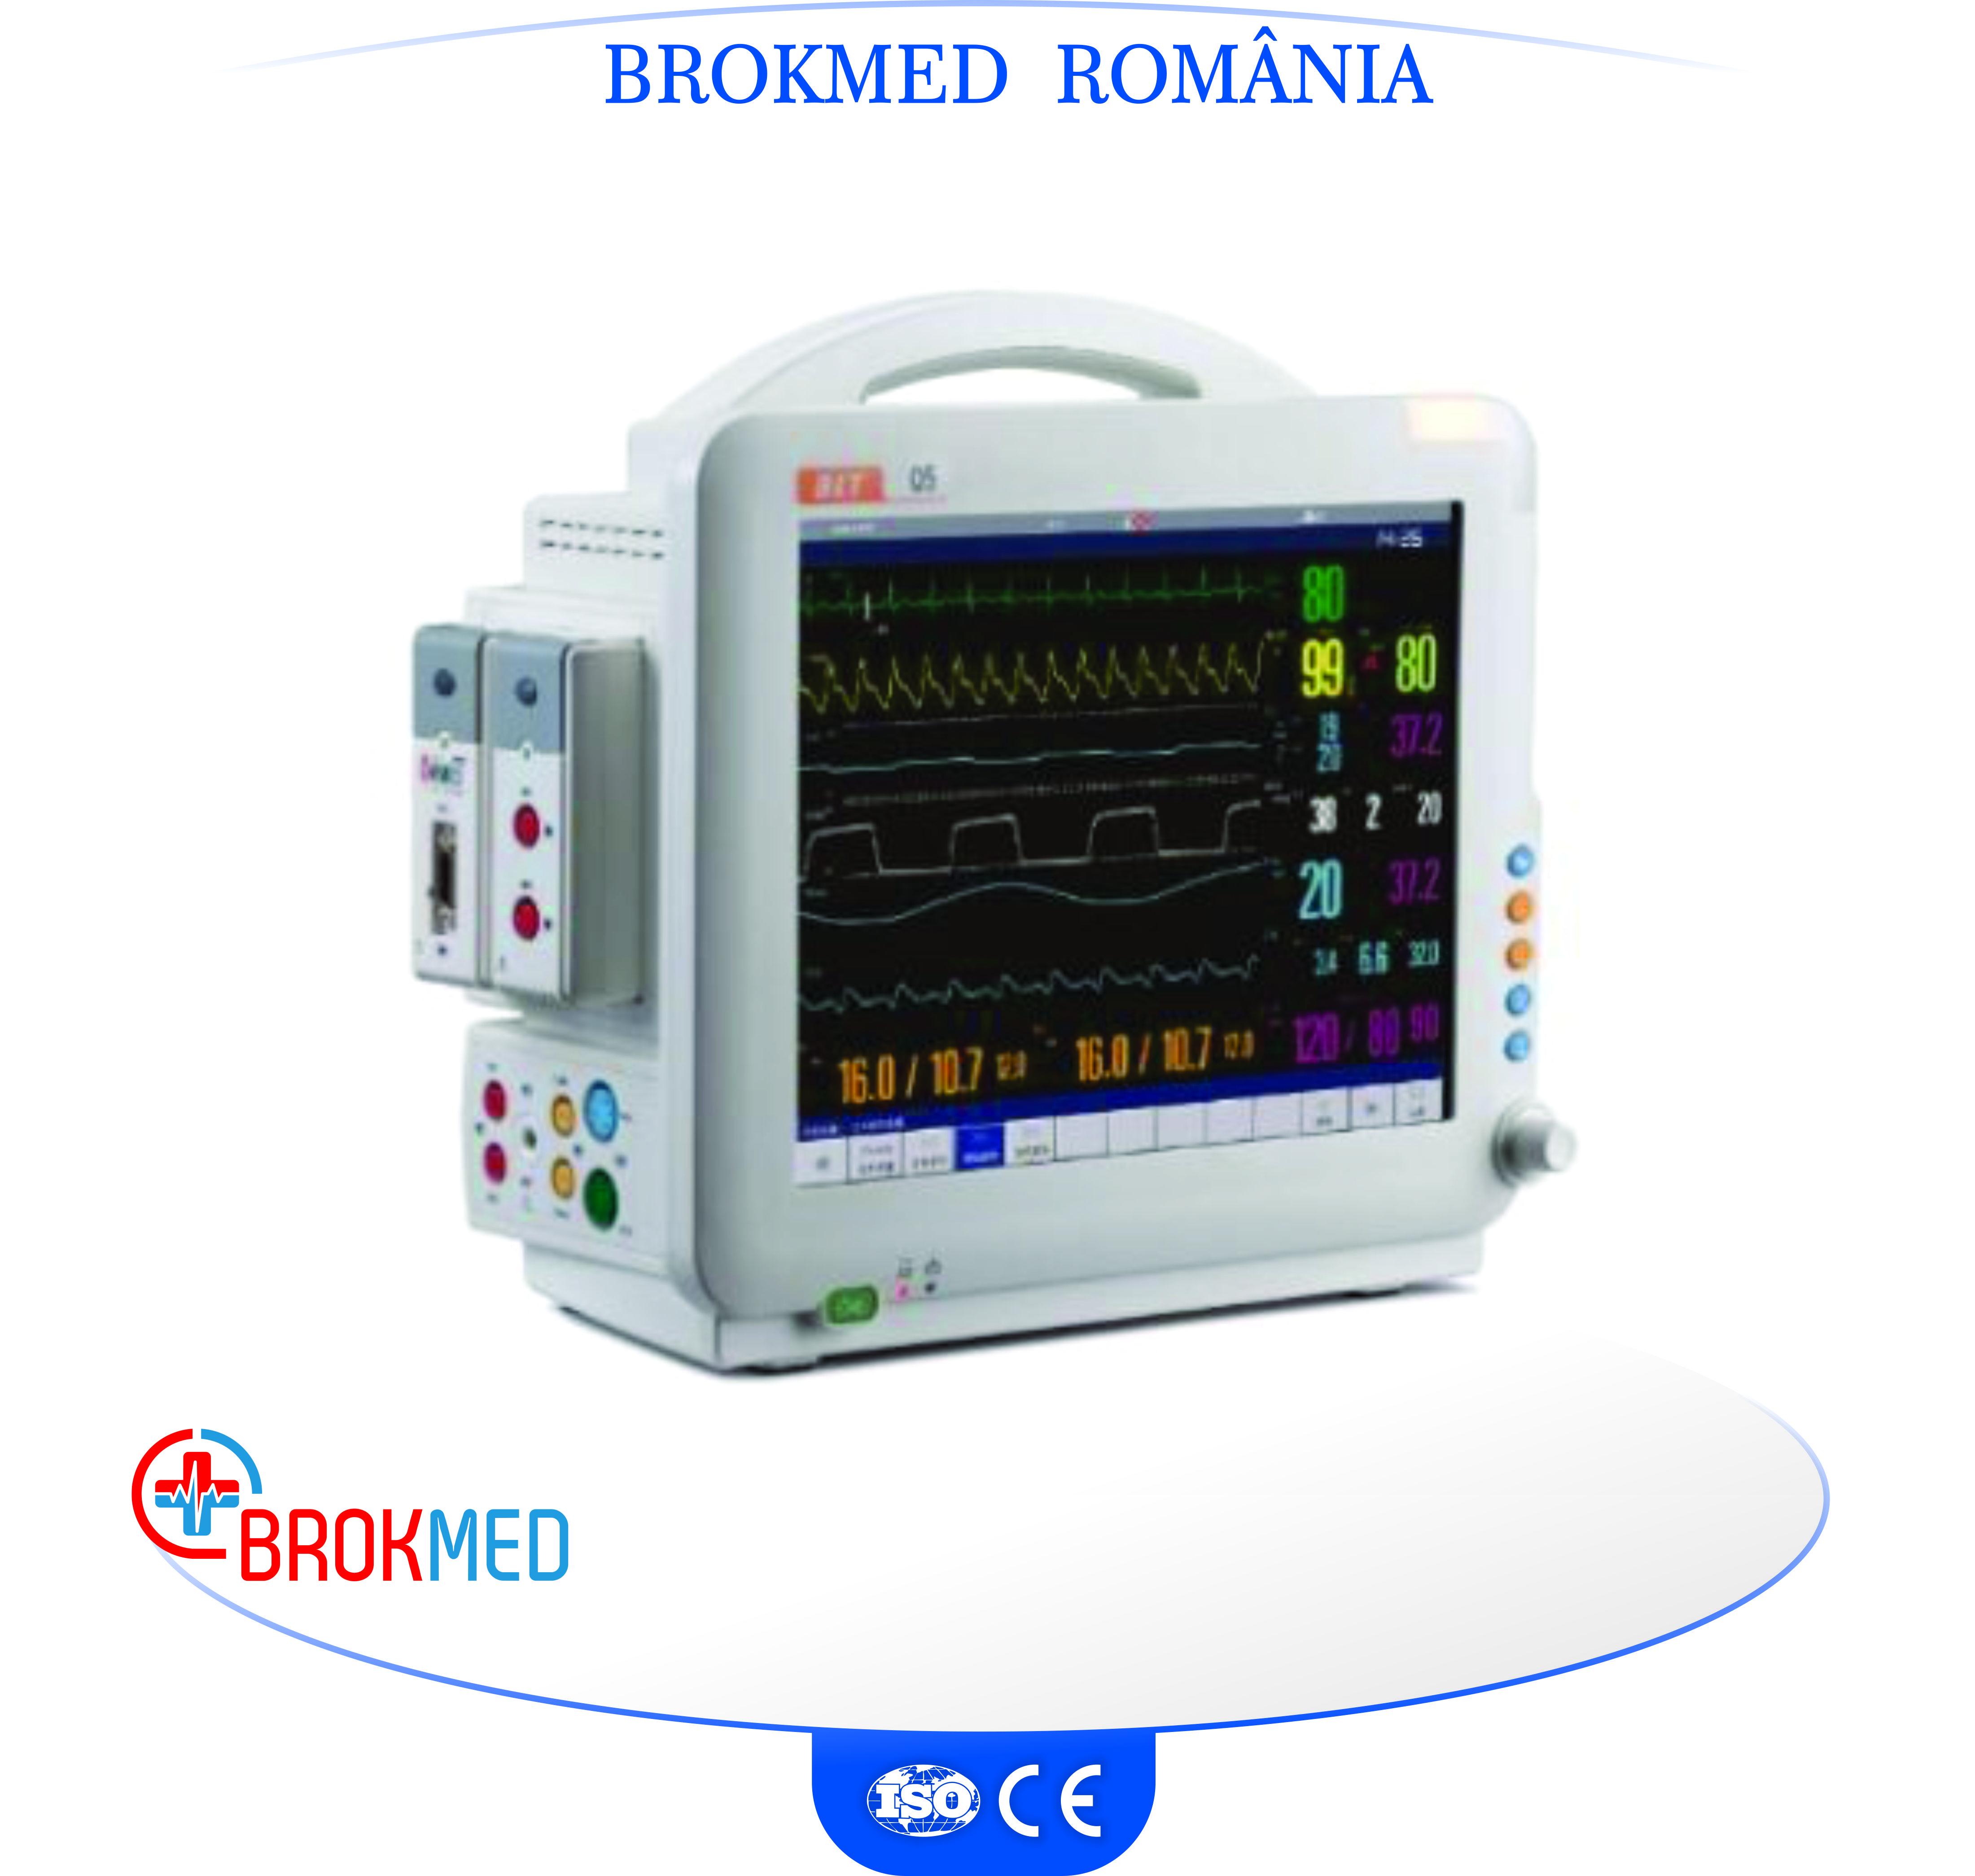 Monitor pacient Q5 cu interfata in limba romana